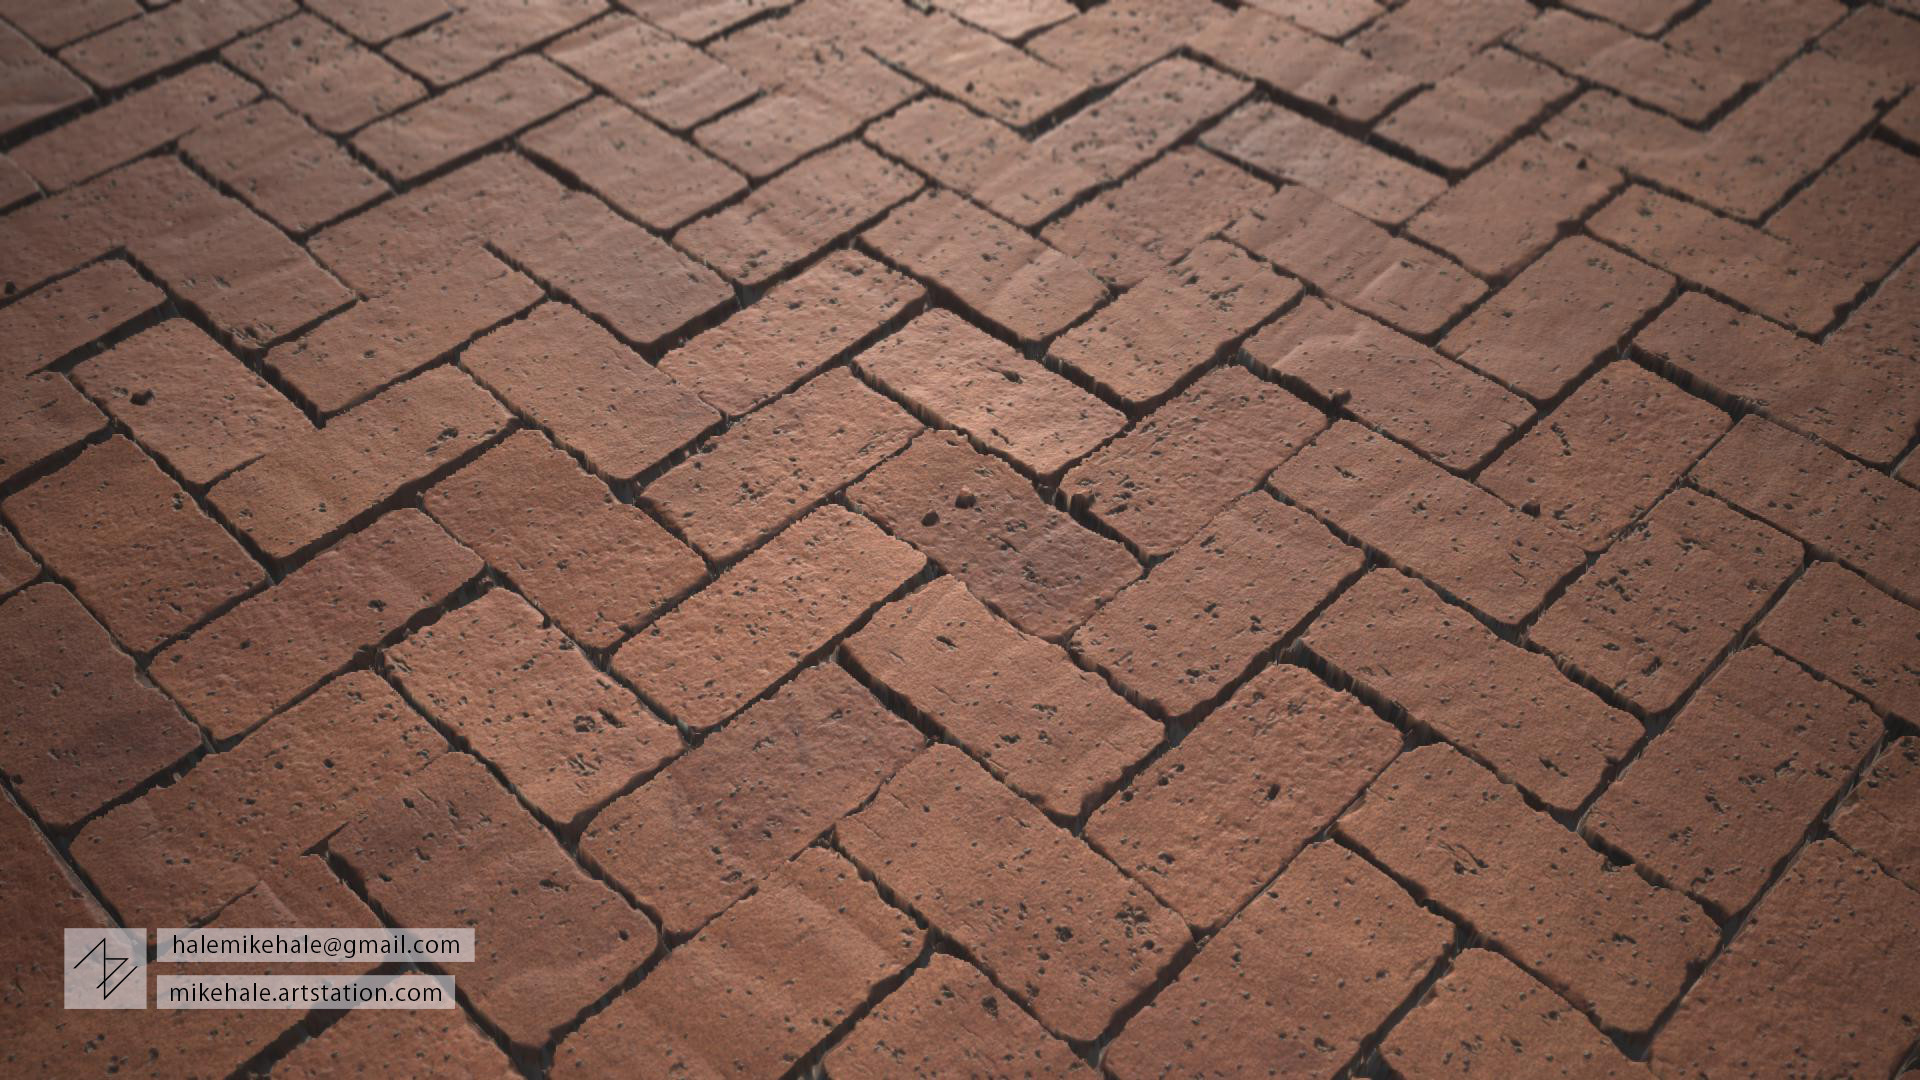 Mike hale herringbone pavement final 02